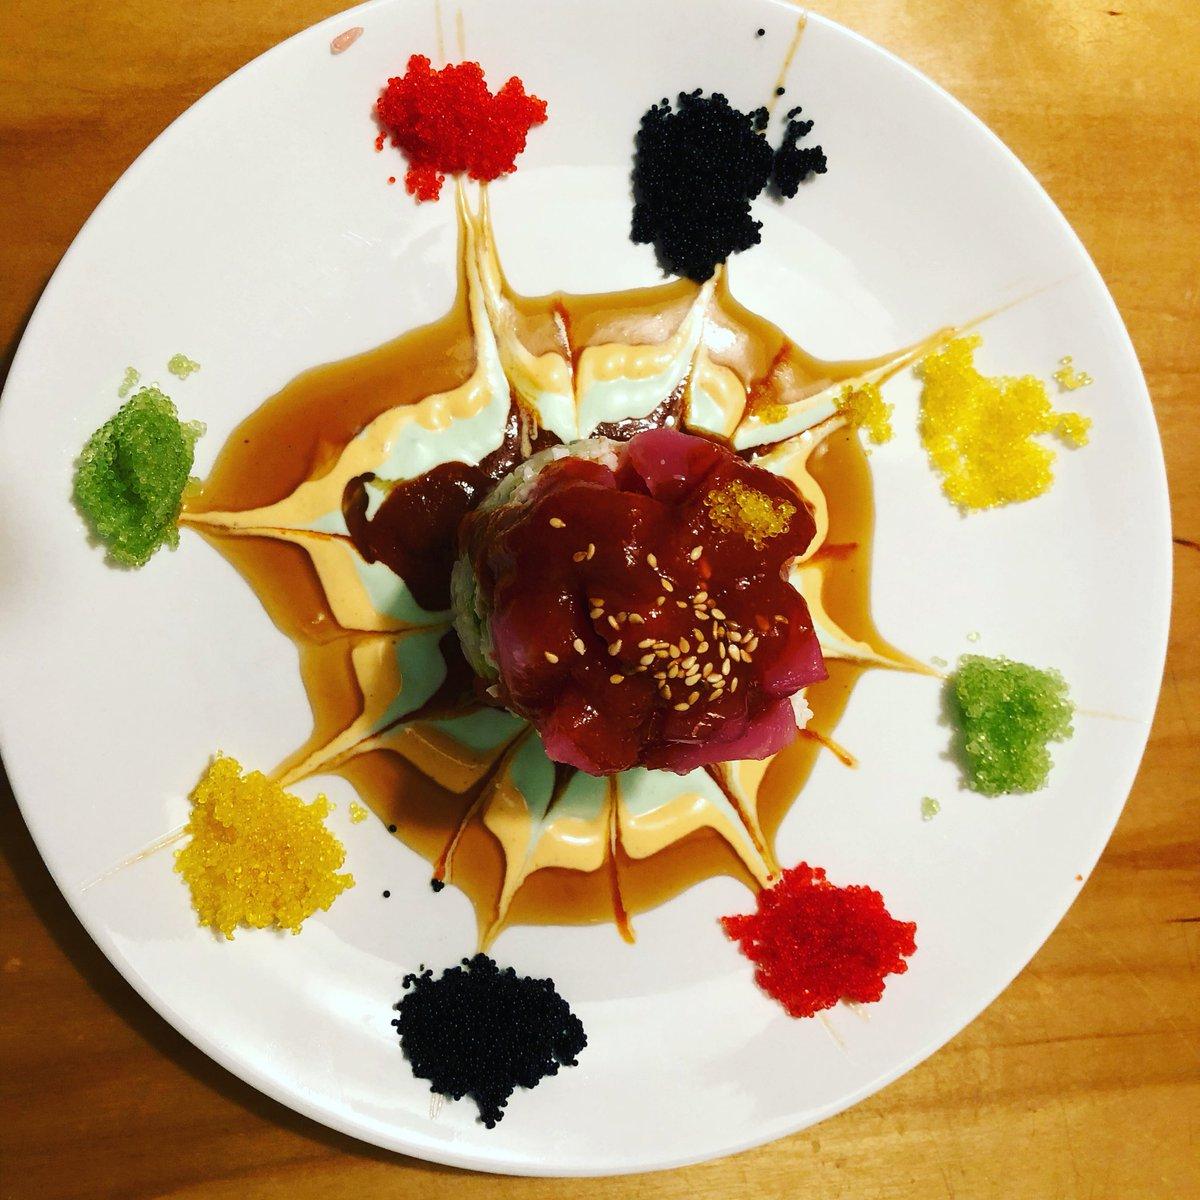 Omg gimme in my mouth #sushi instagram.com/p/BgK2EYEFO99/